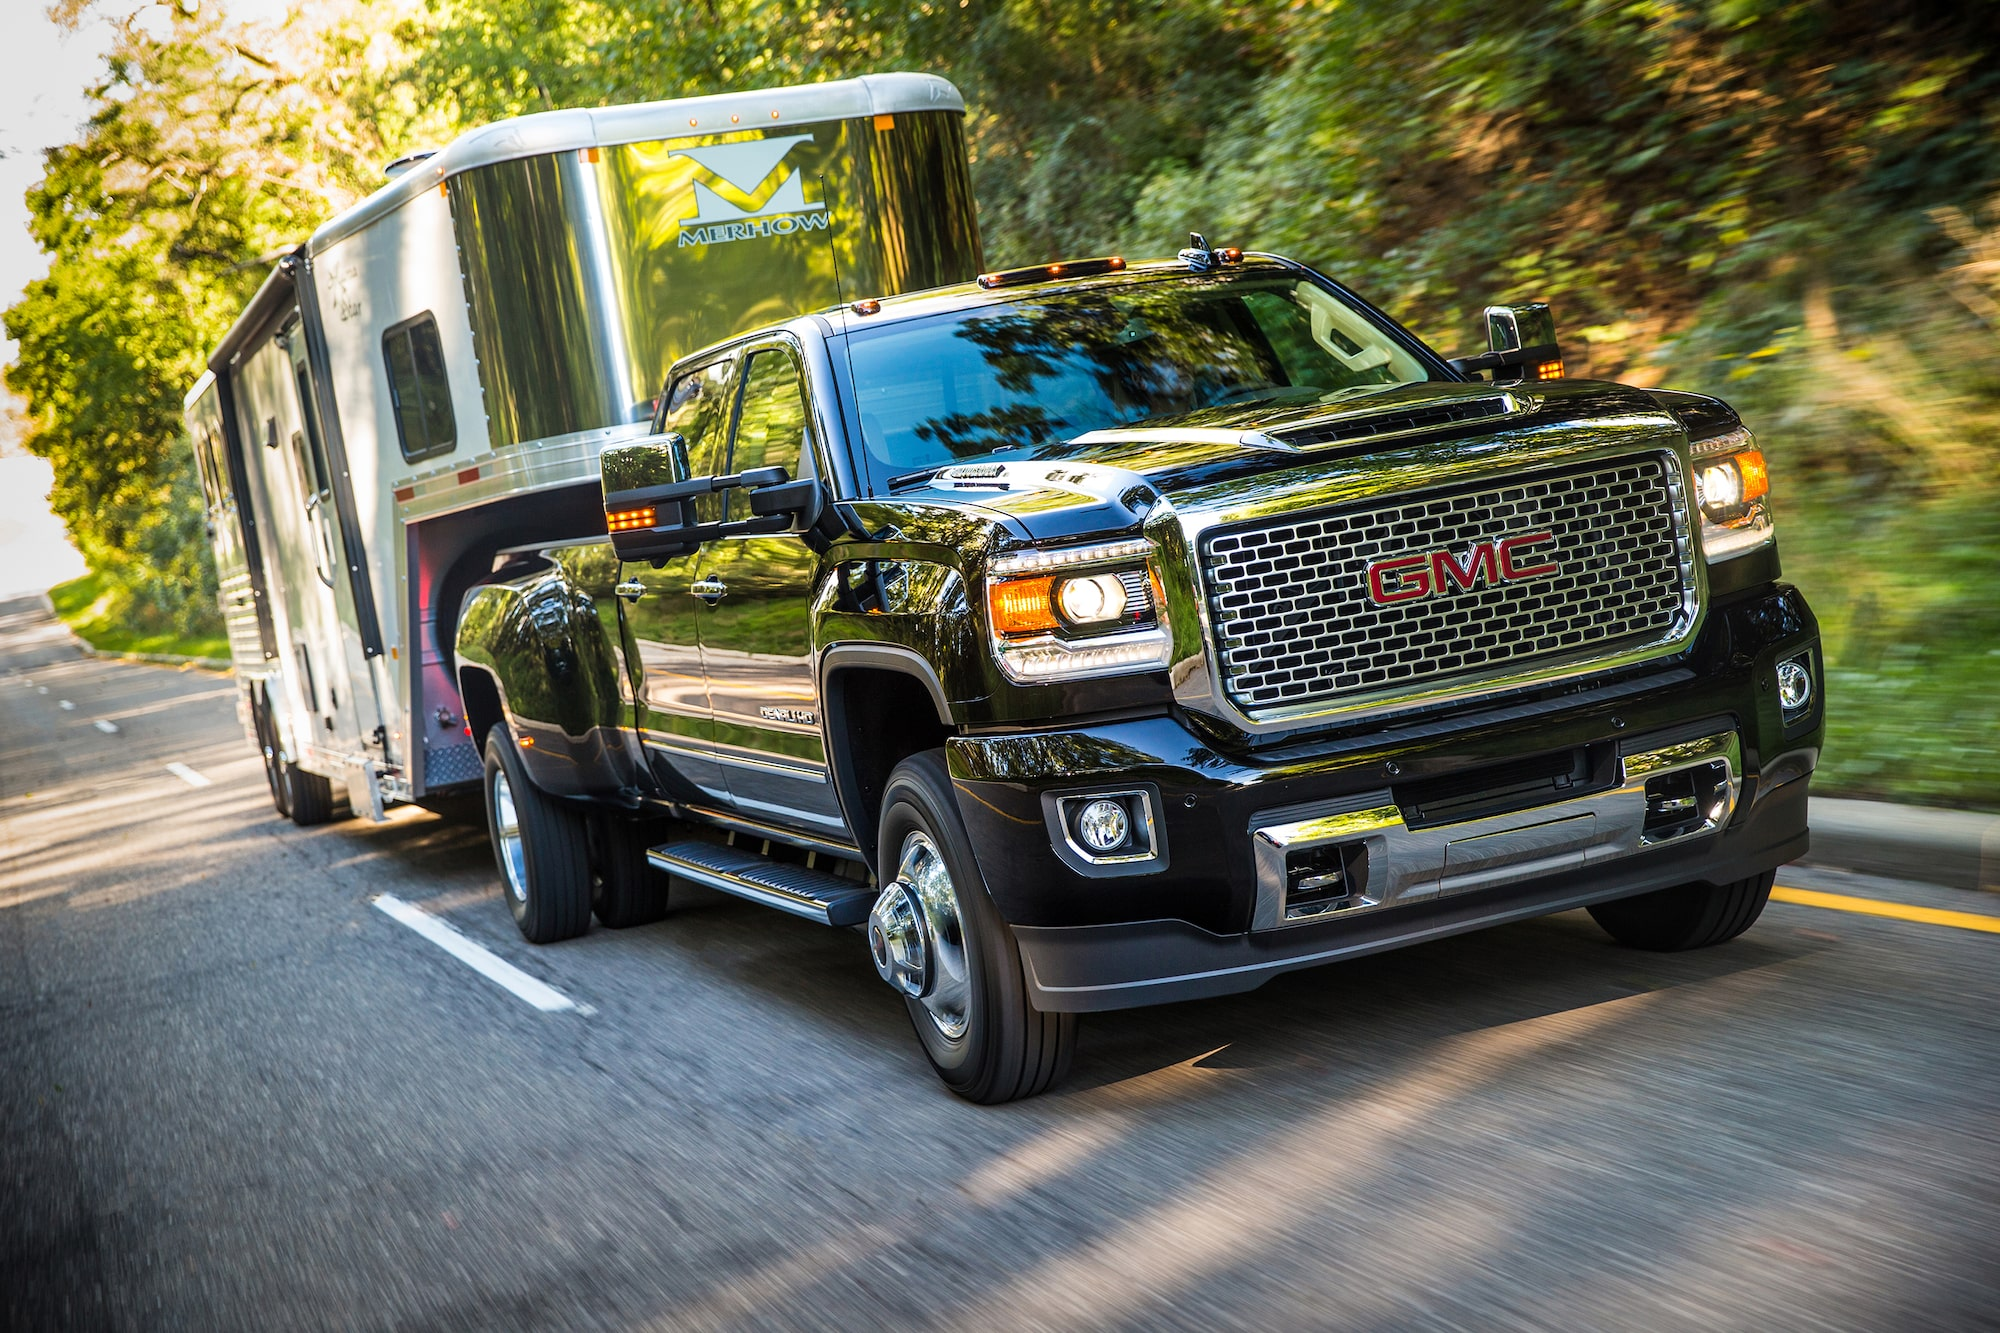 gmc life duramax diesel trailering  [ 2048 x 1365 Pixel ]